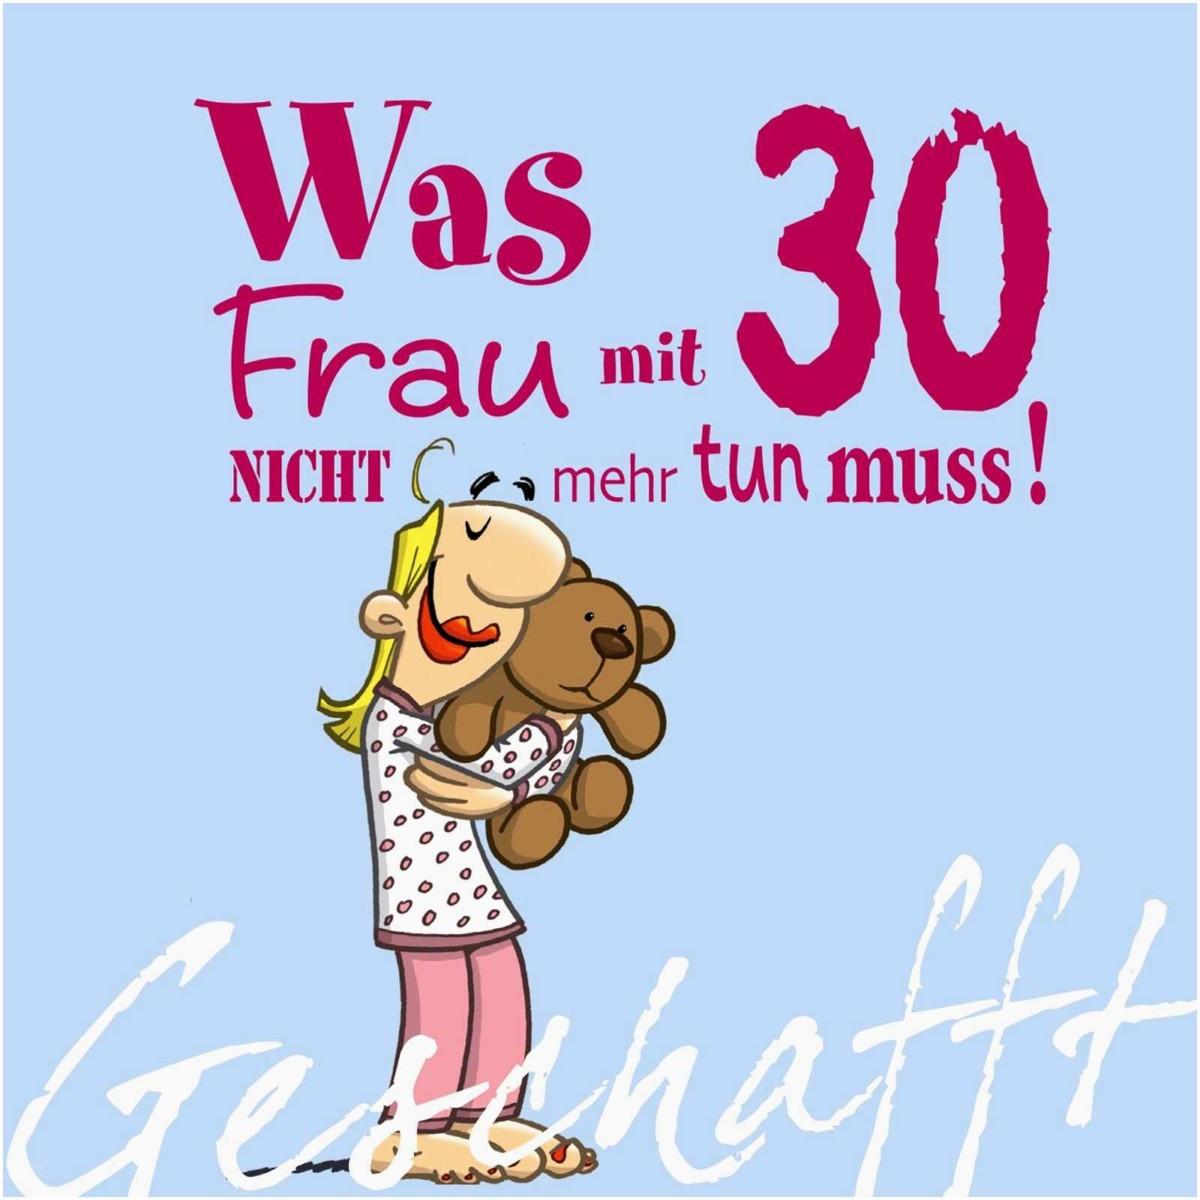 Geburtstagswünsche Frau Lustig  geburtstag 30 frau spruch Fabelhaft Alles Gute Zum 30